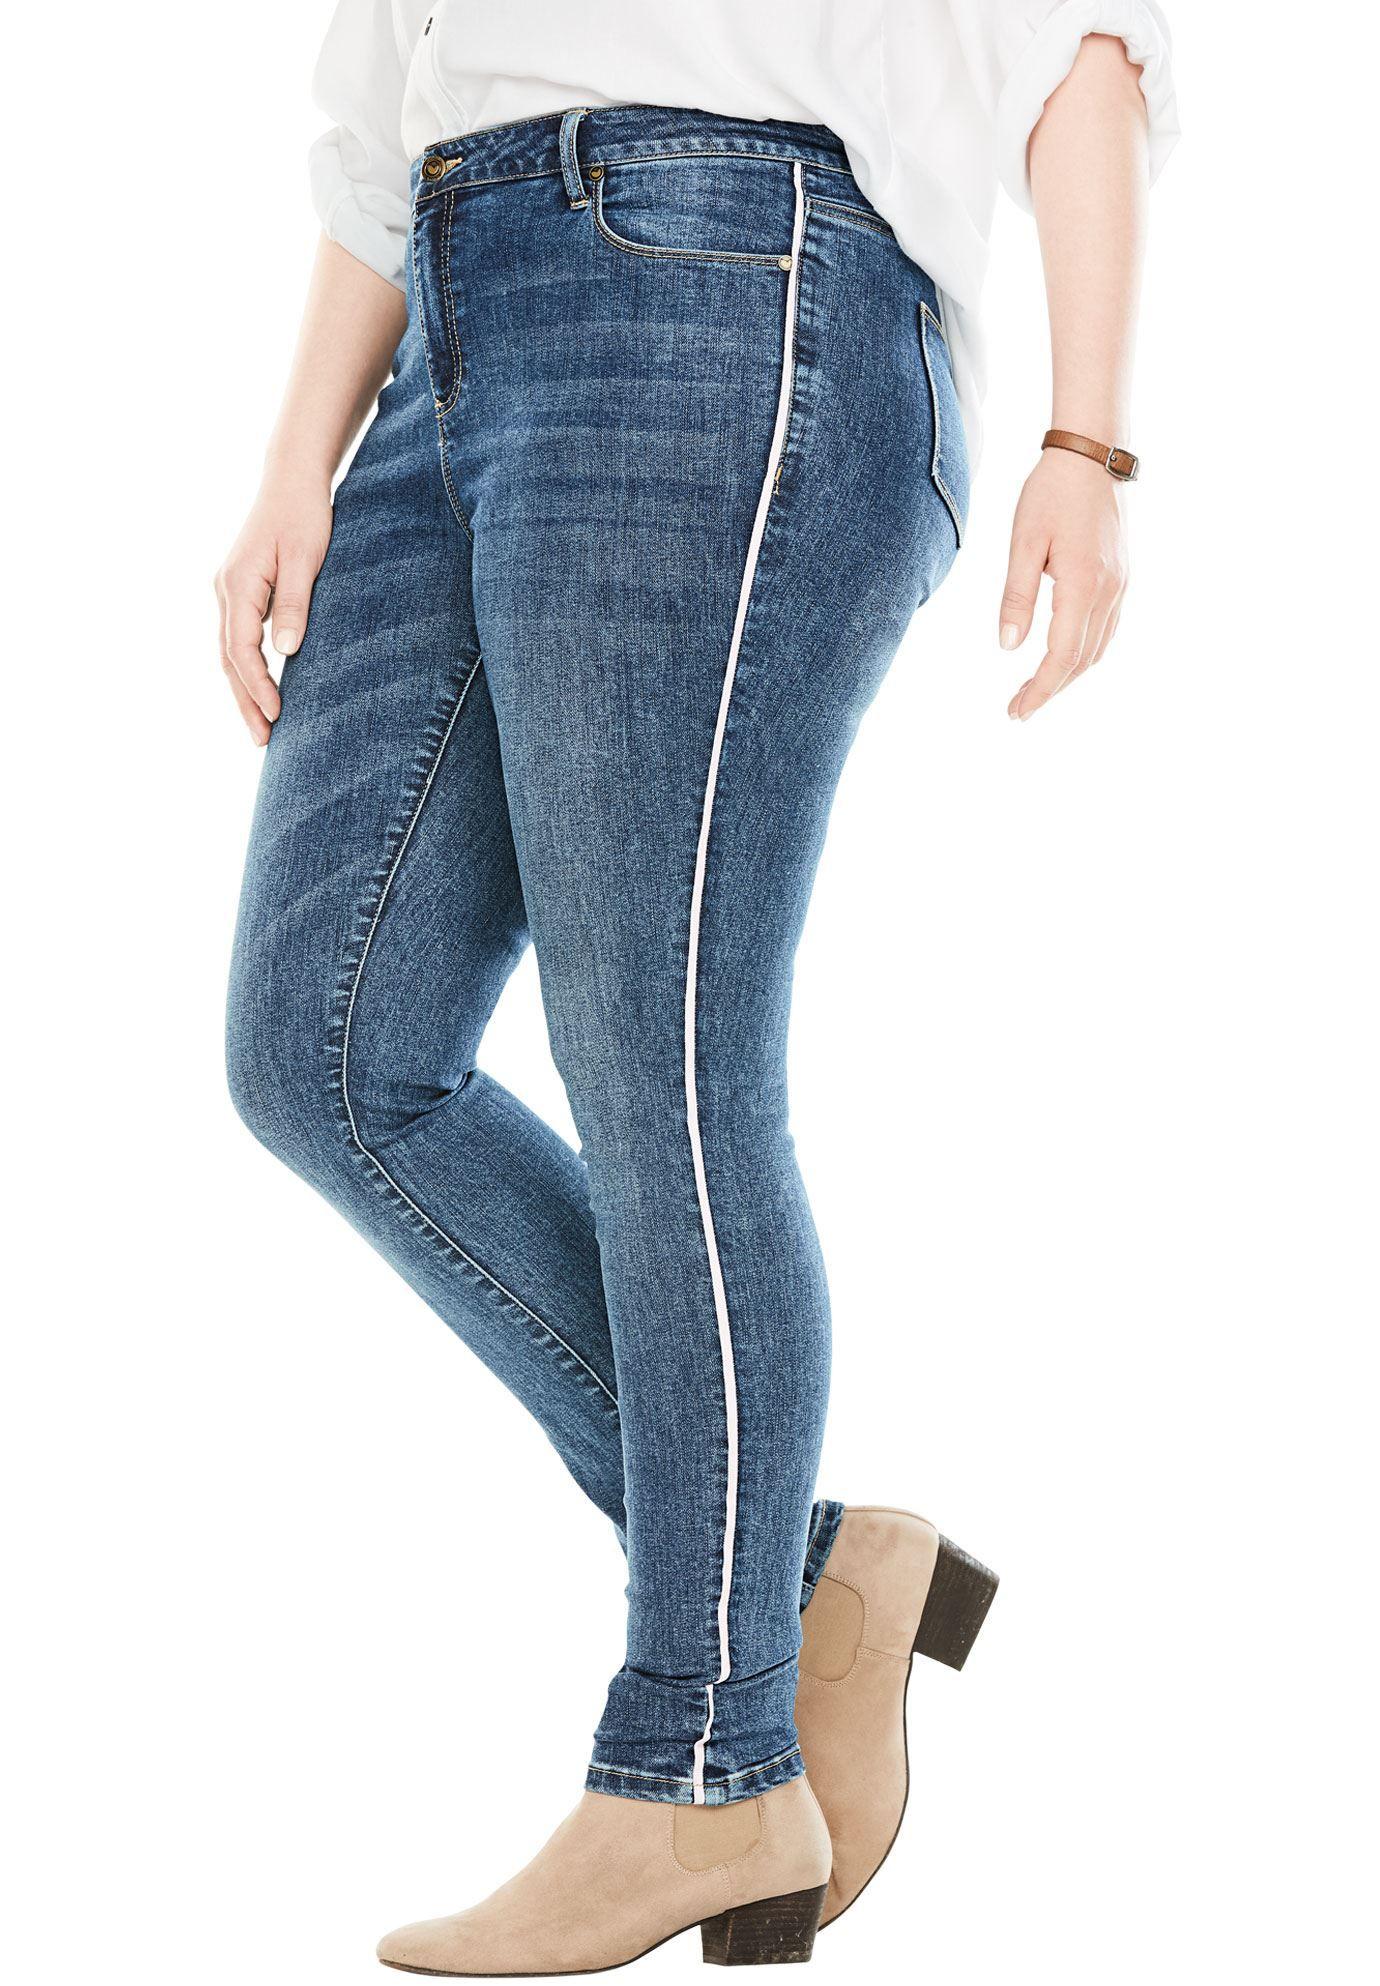 7ac7972c0d5 Skinny Super Stretch Jean - Women s Plus Size Clothing